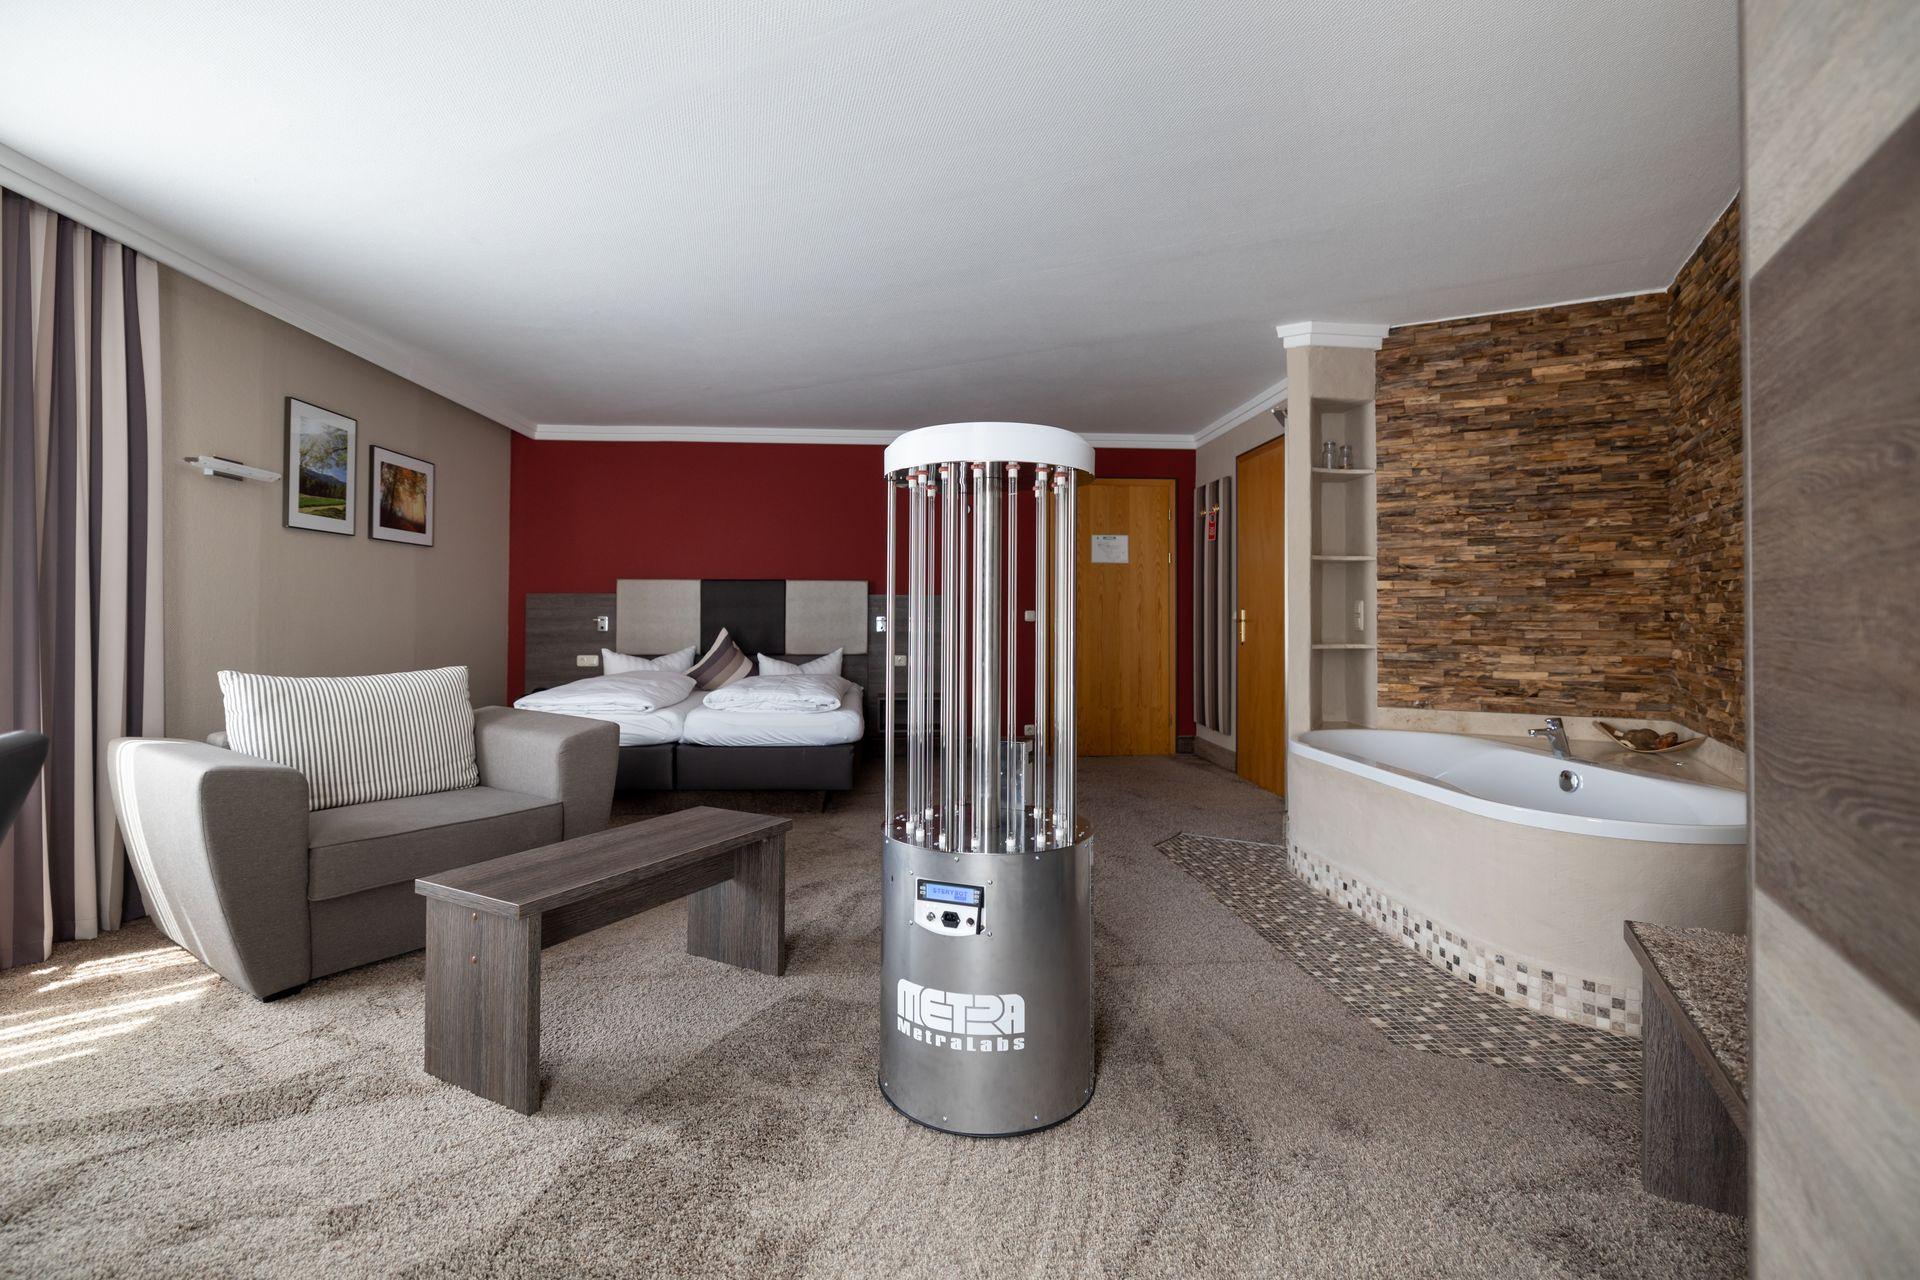 Desinfektionsroboter im Hotelzimmer - MetraLabs GmbH - STERYBOT